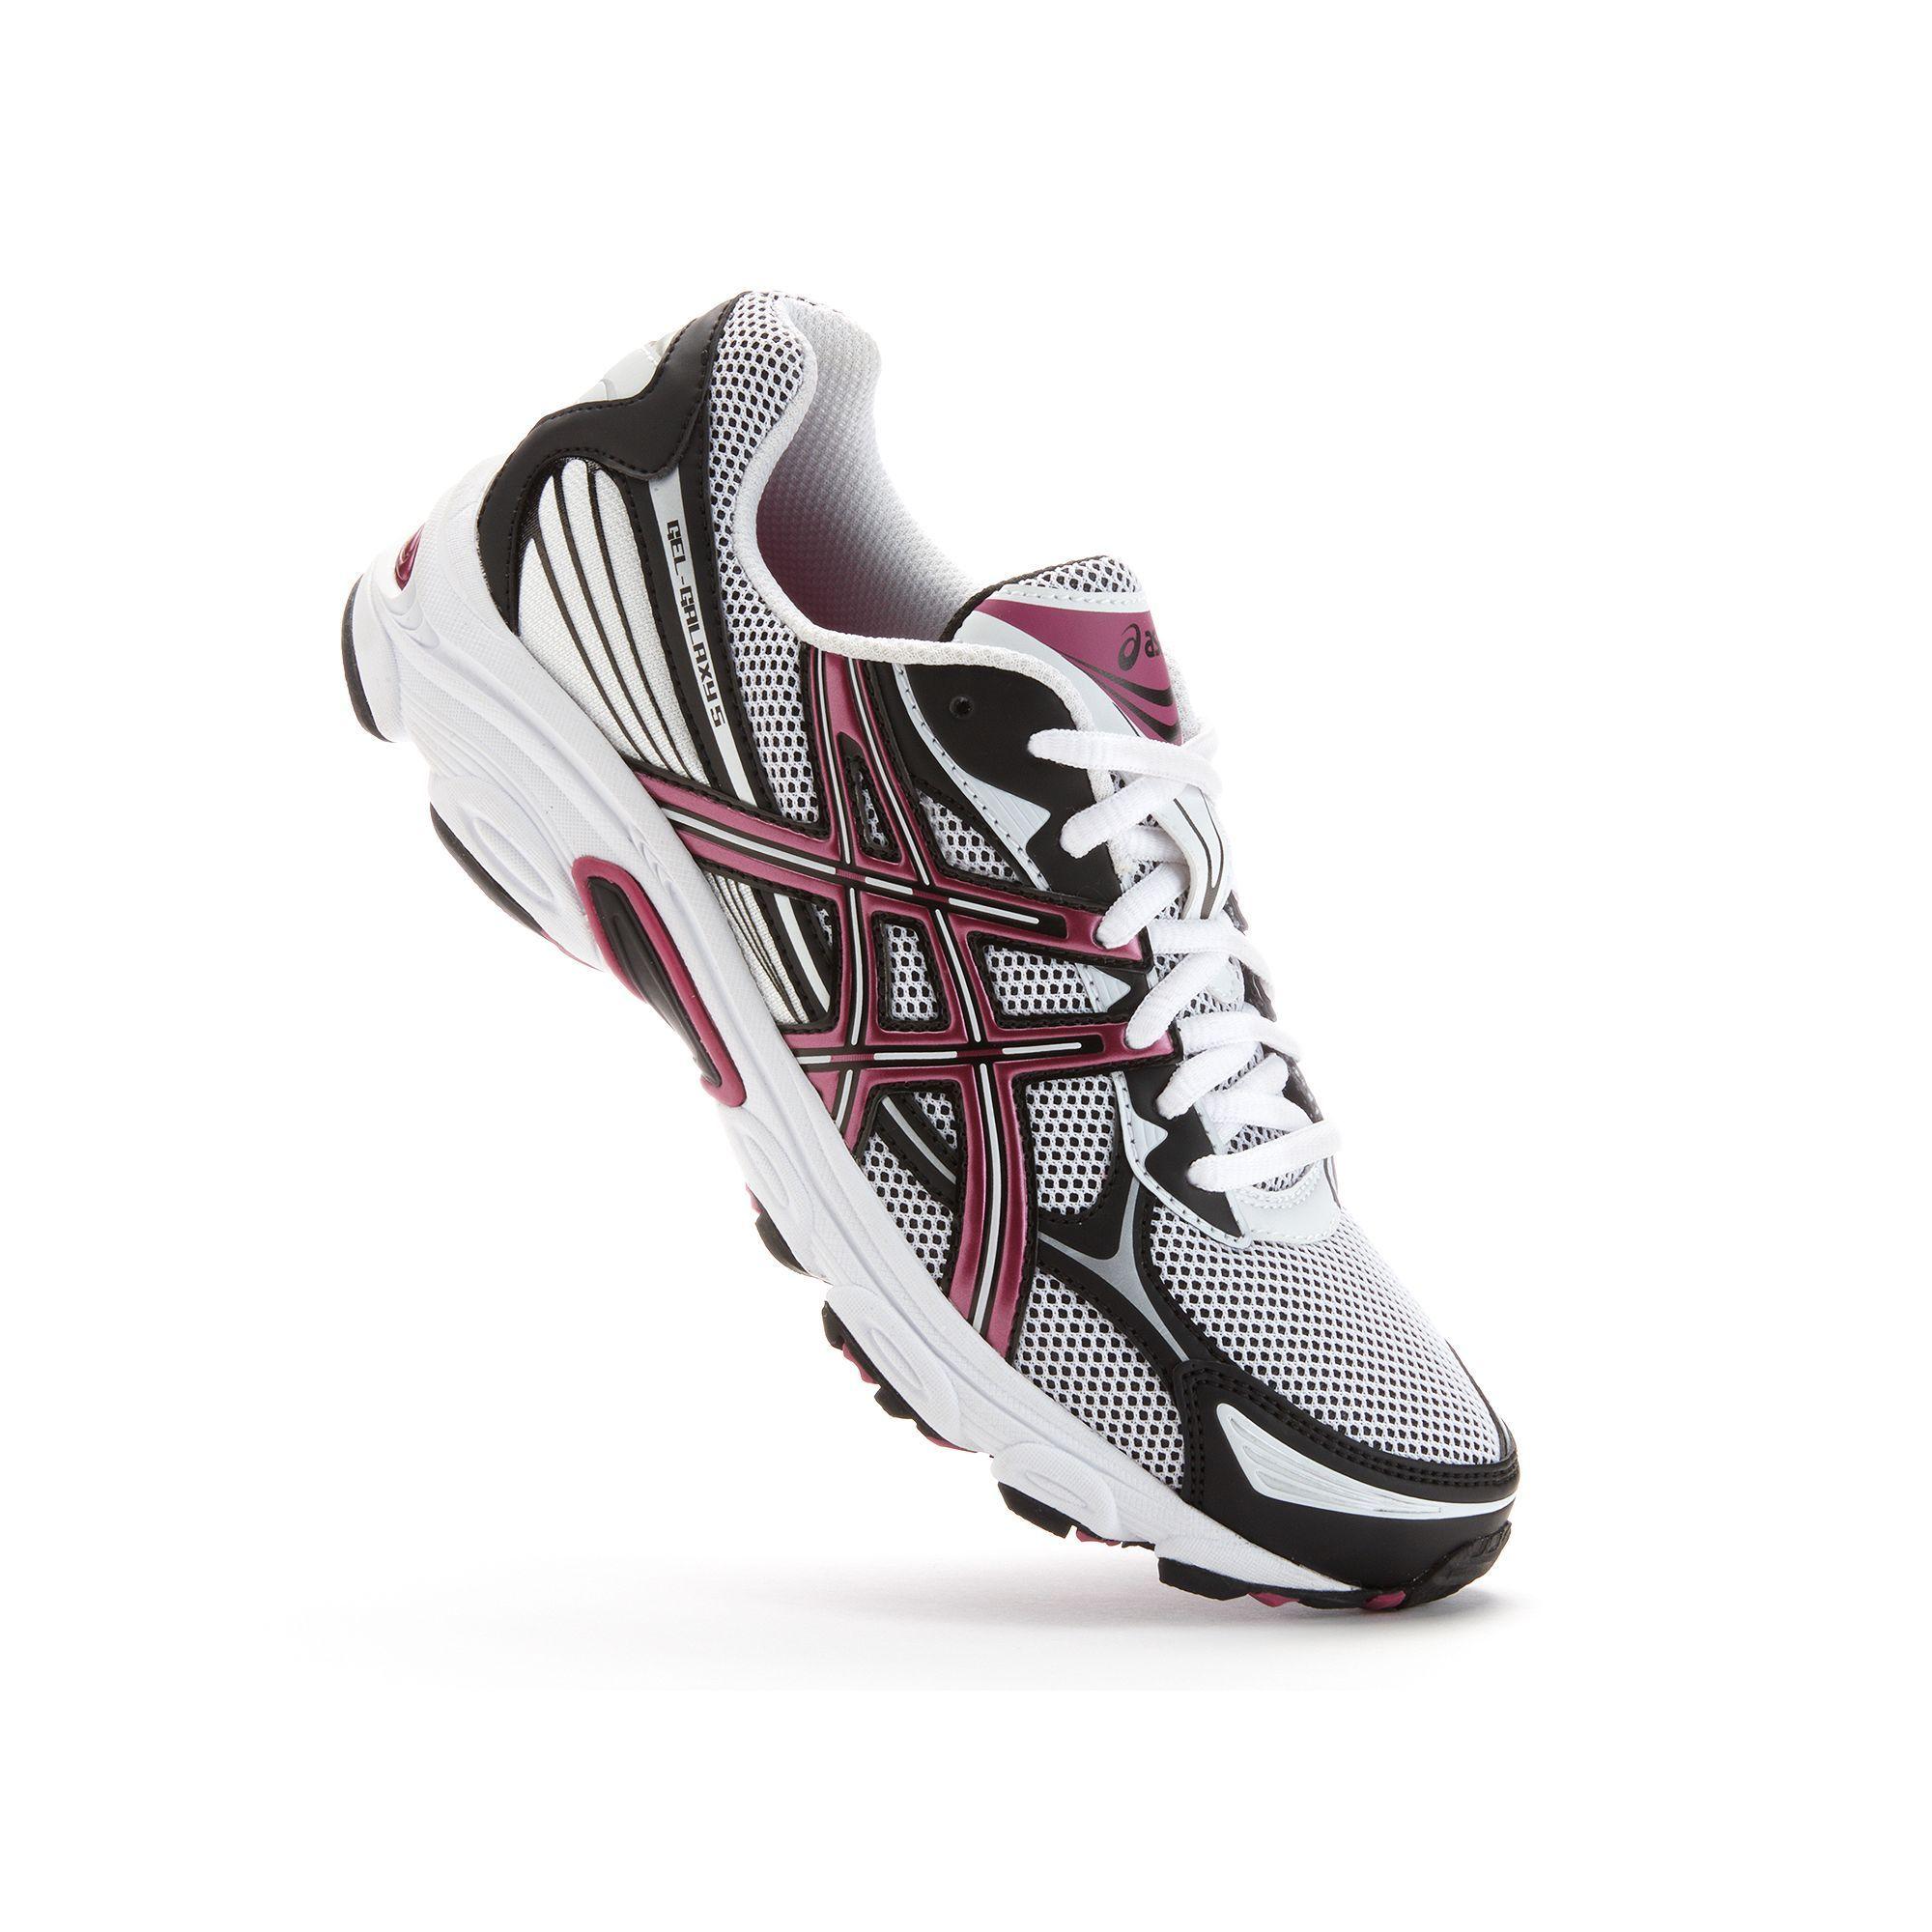 ASICS Gel-Galaxy 5 Women's Running Shoes, Size: 11, White Oth